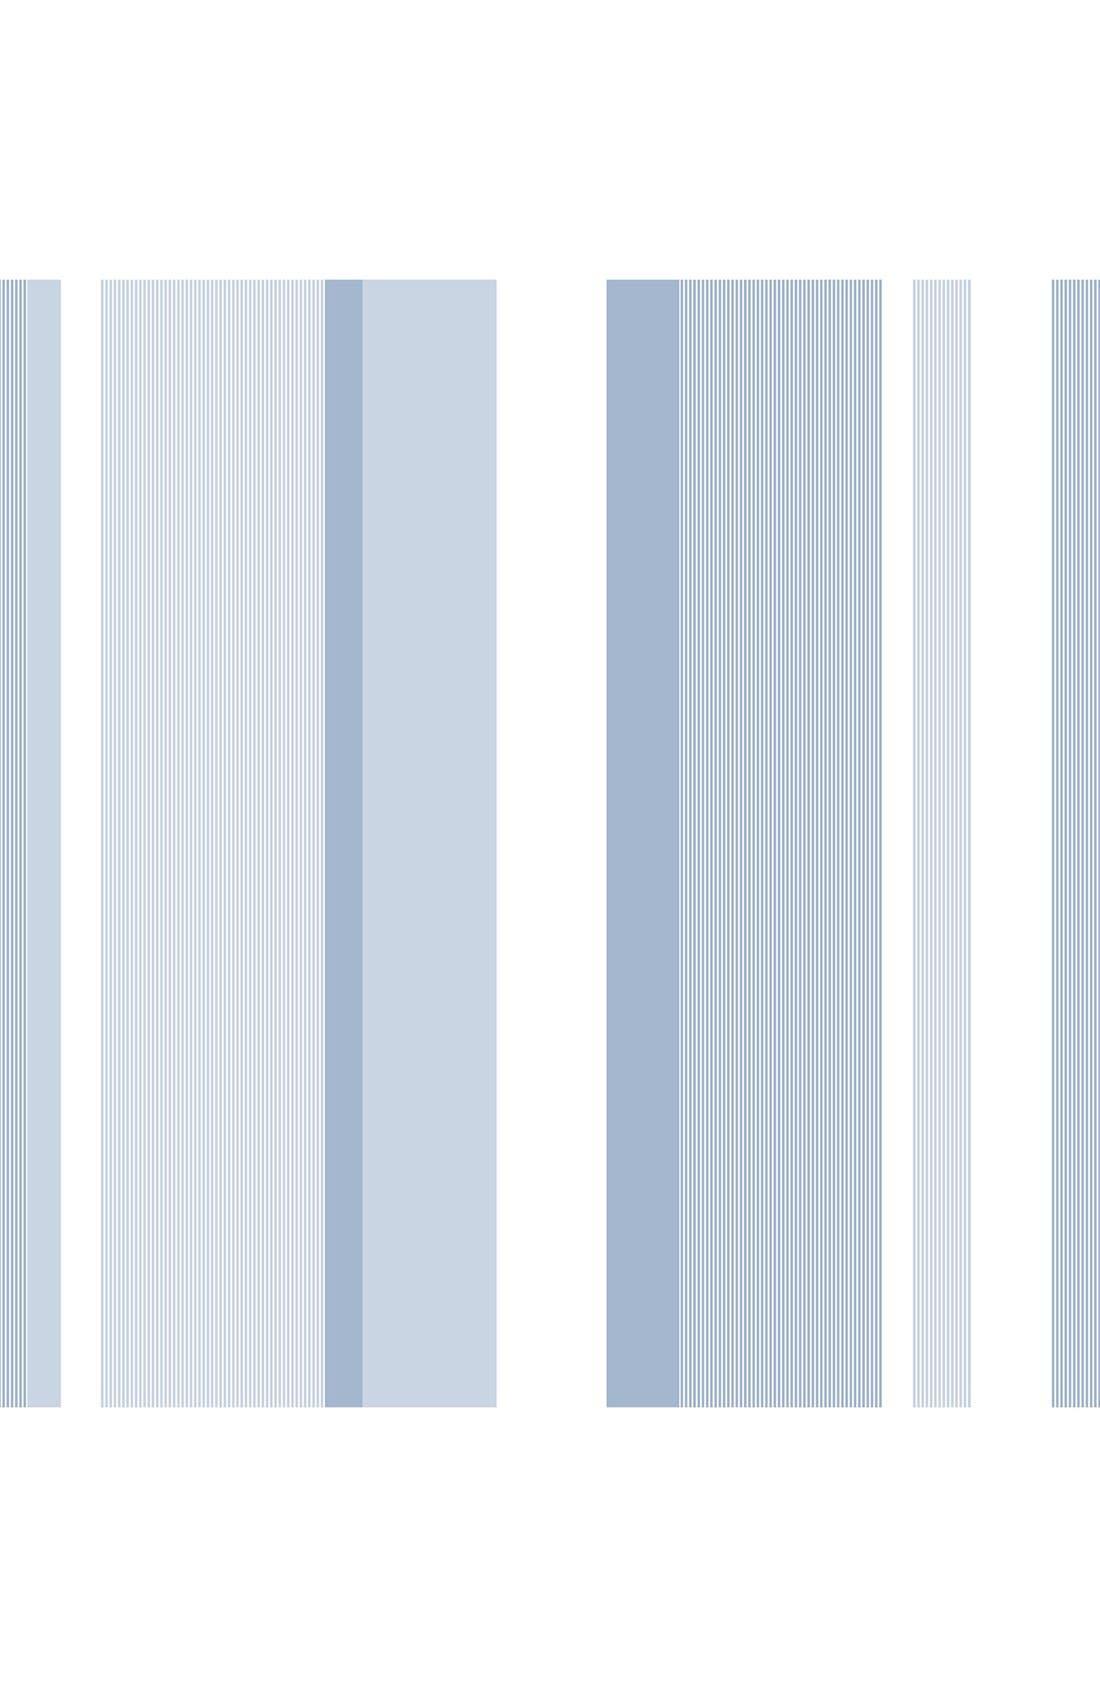 Alternate Image 1 Selected - Wallpops Awning Stripe Reusable Peel & Stick Vinyl Wallpaper